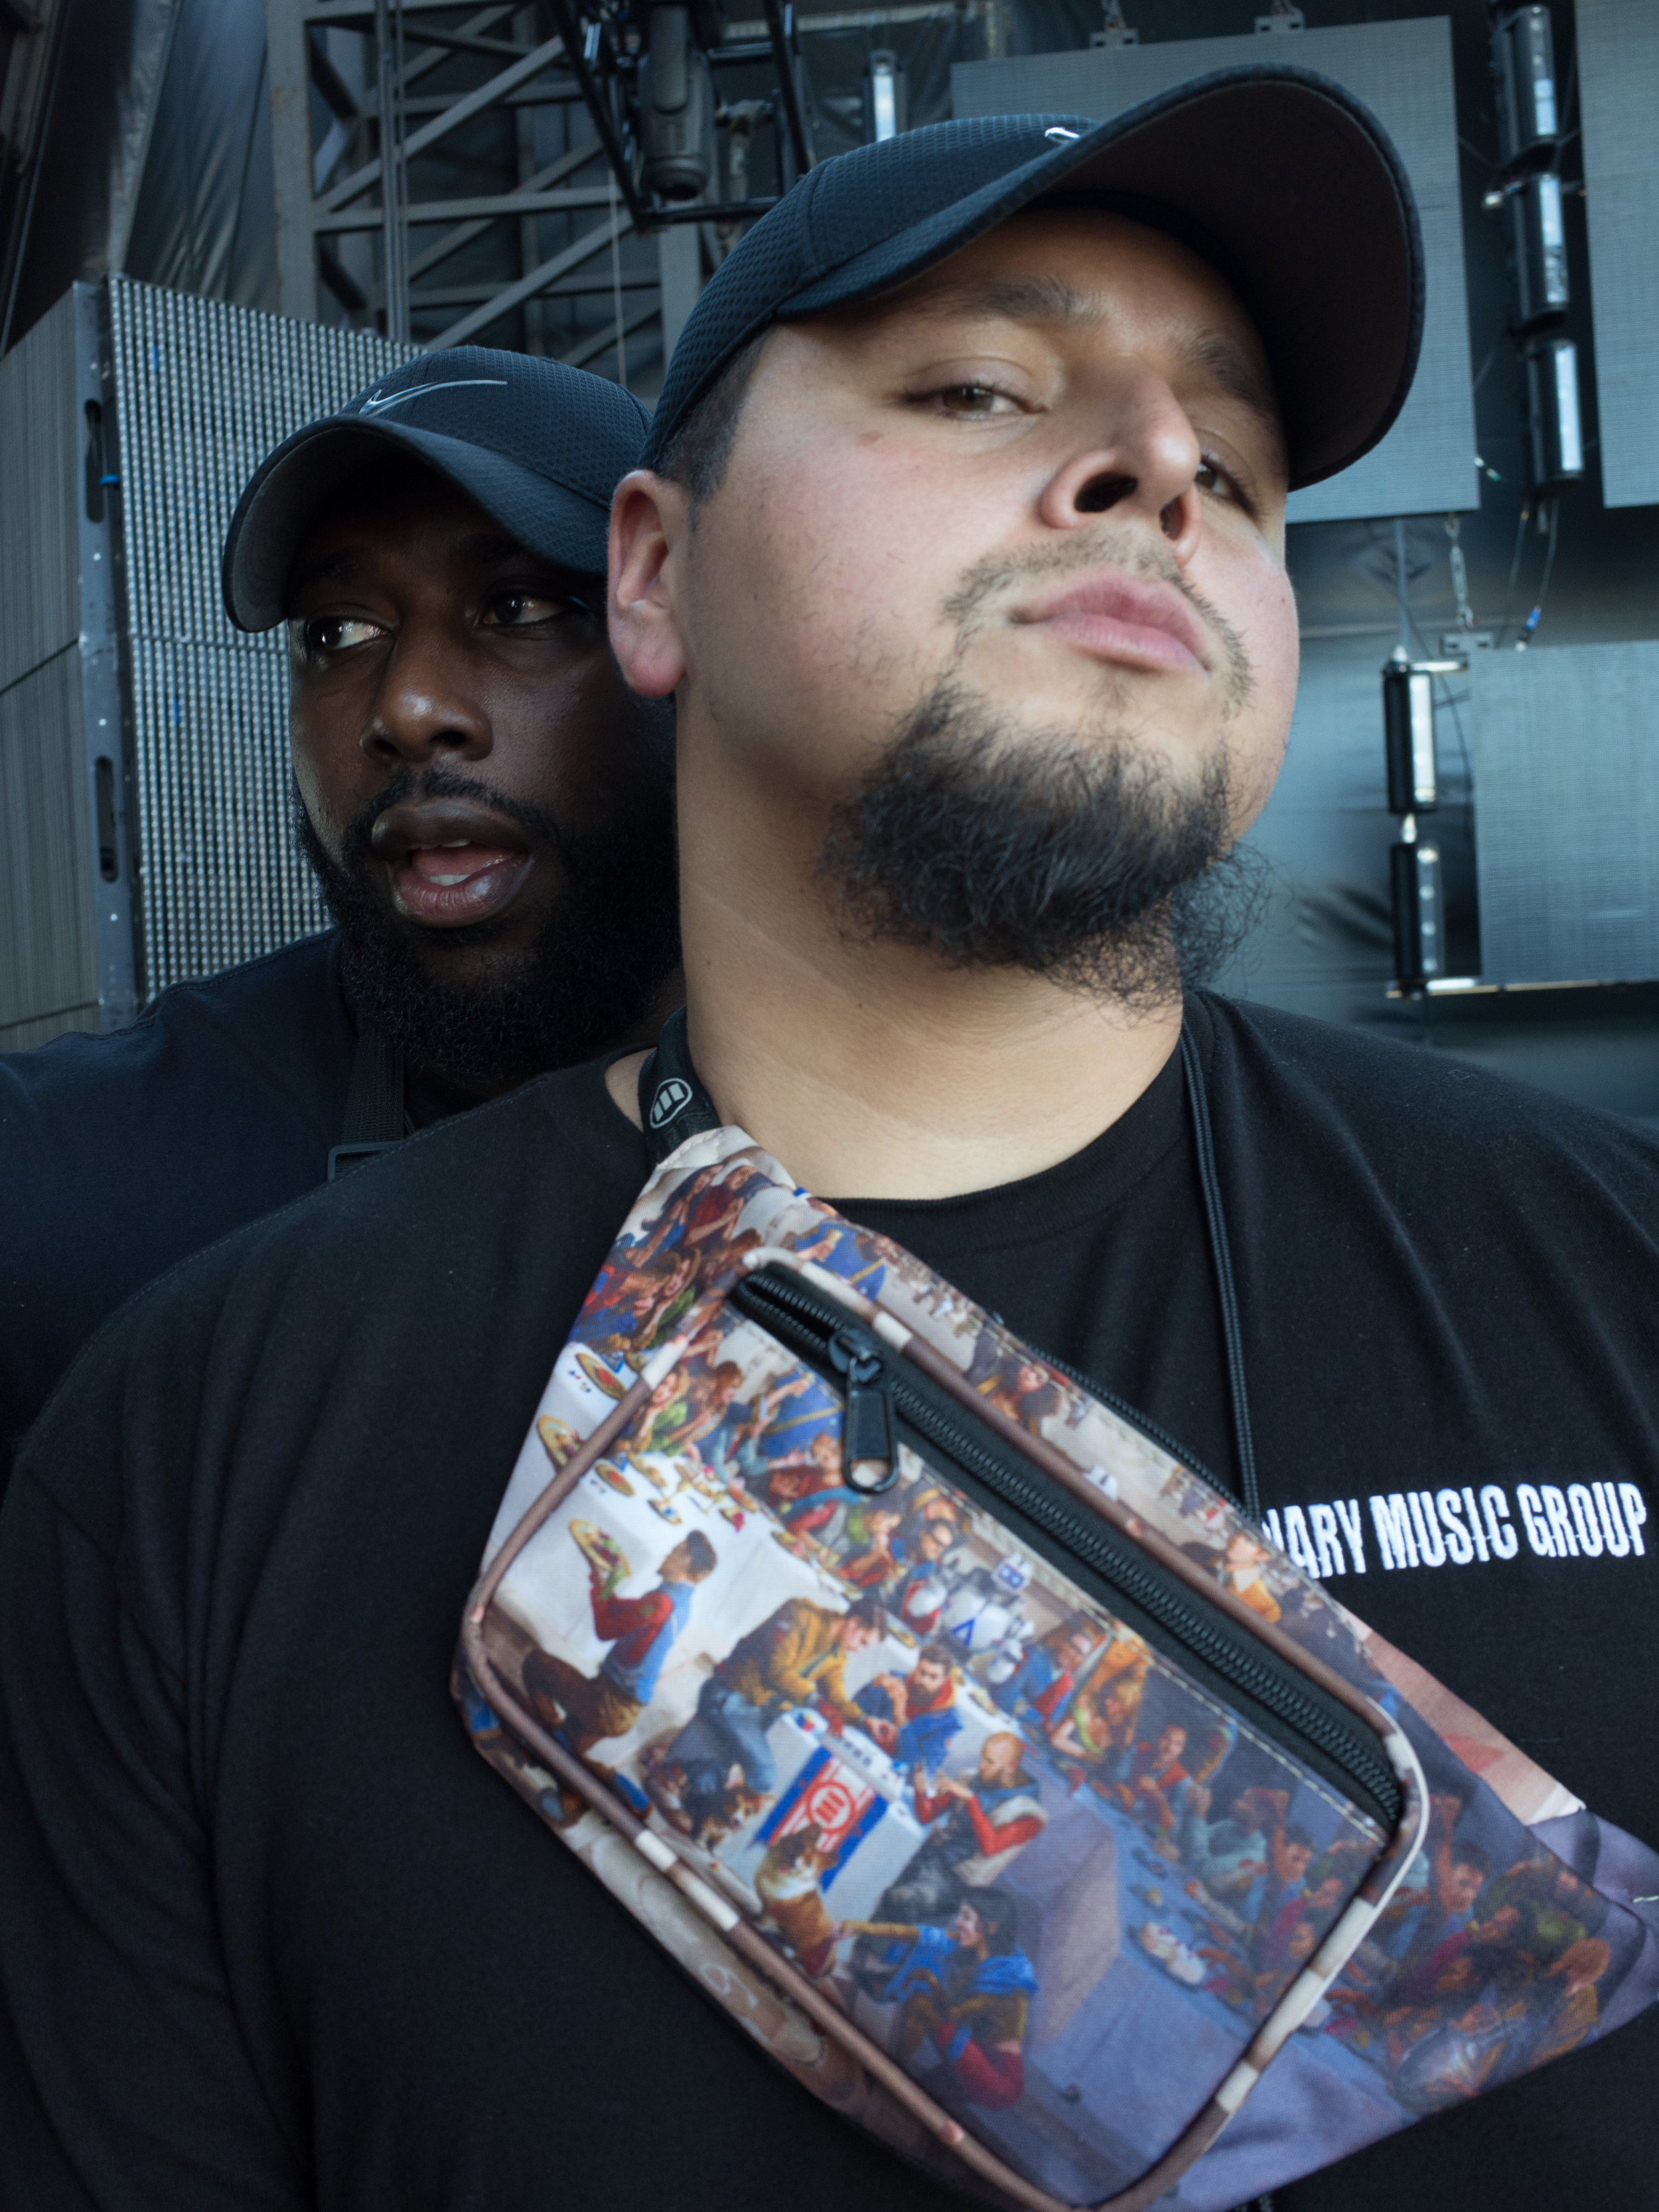 Jordan and Pep during a soundcheck.